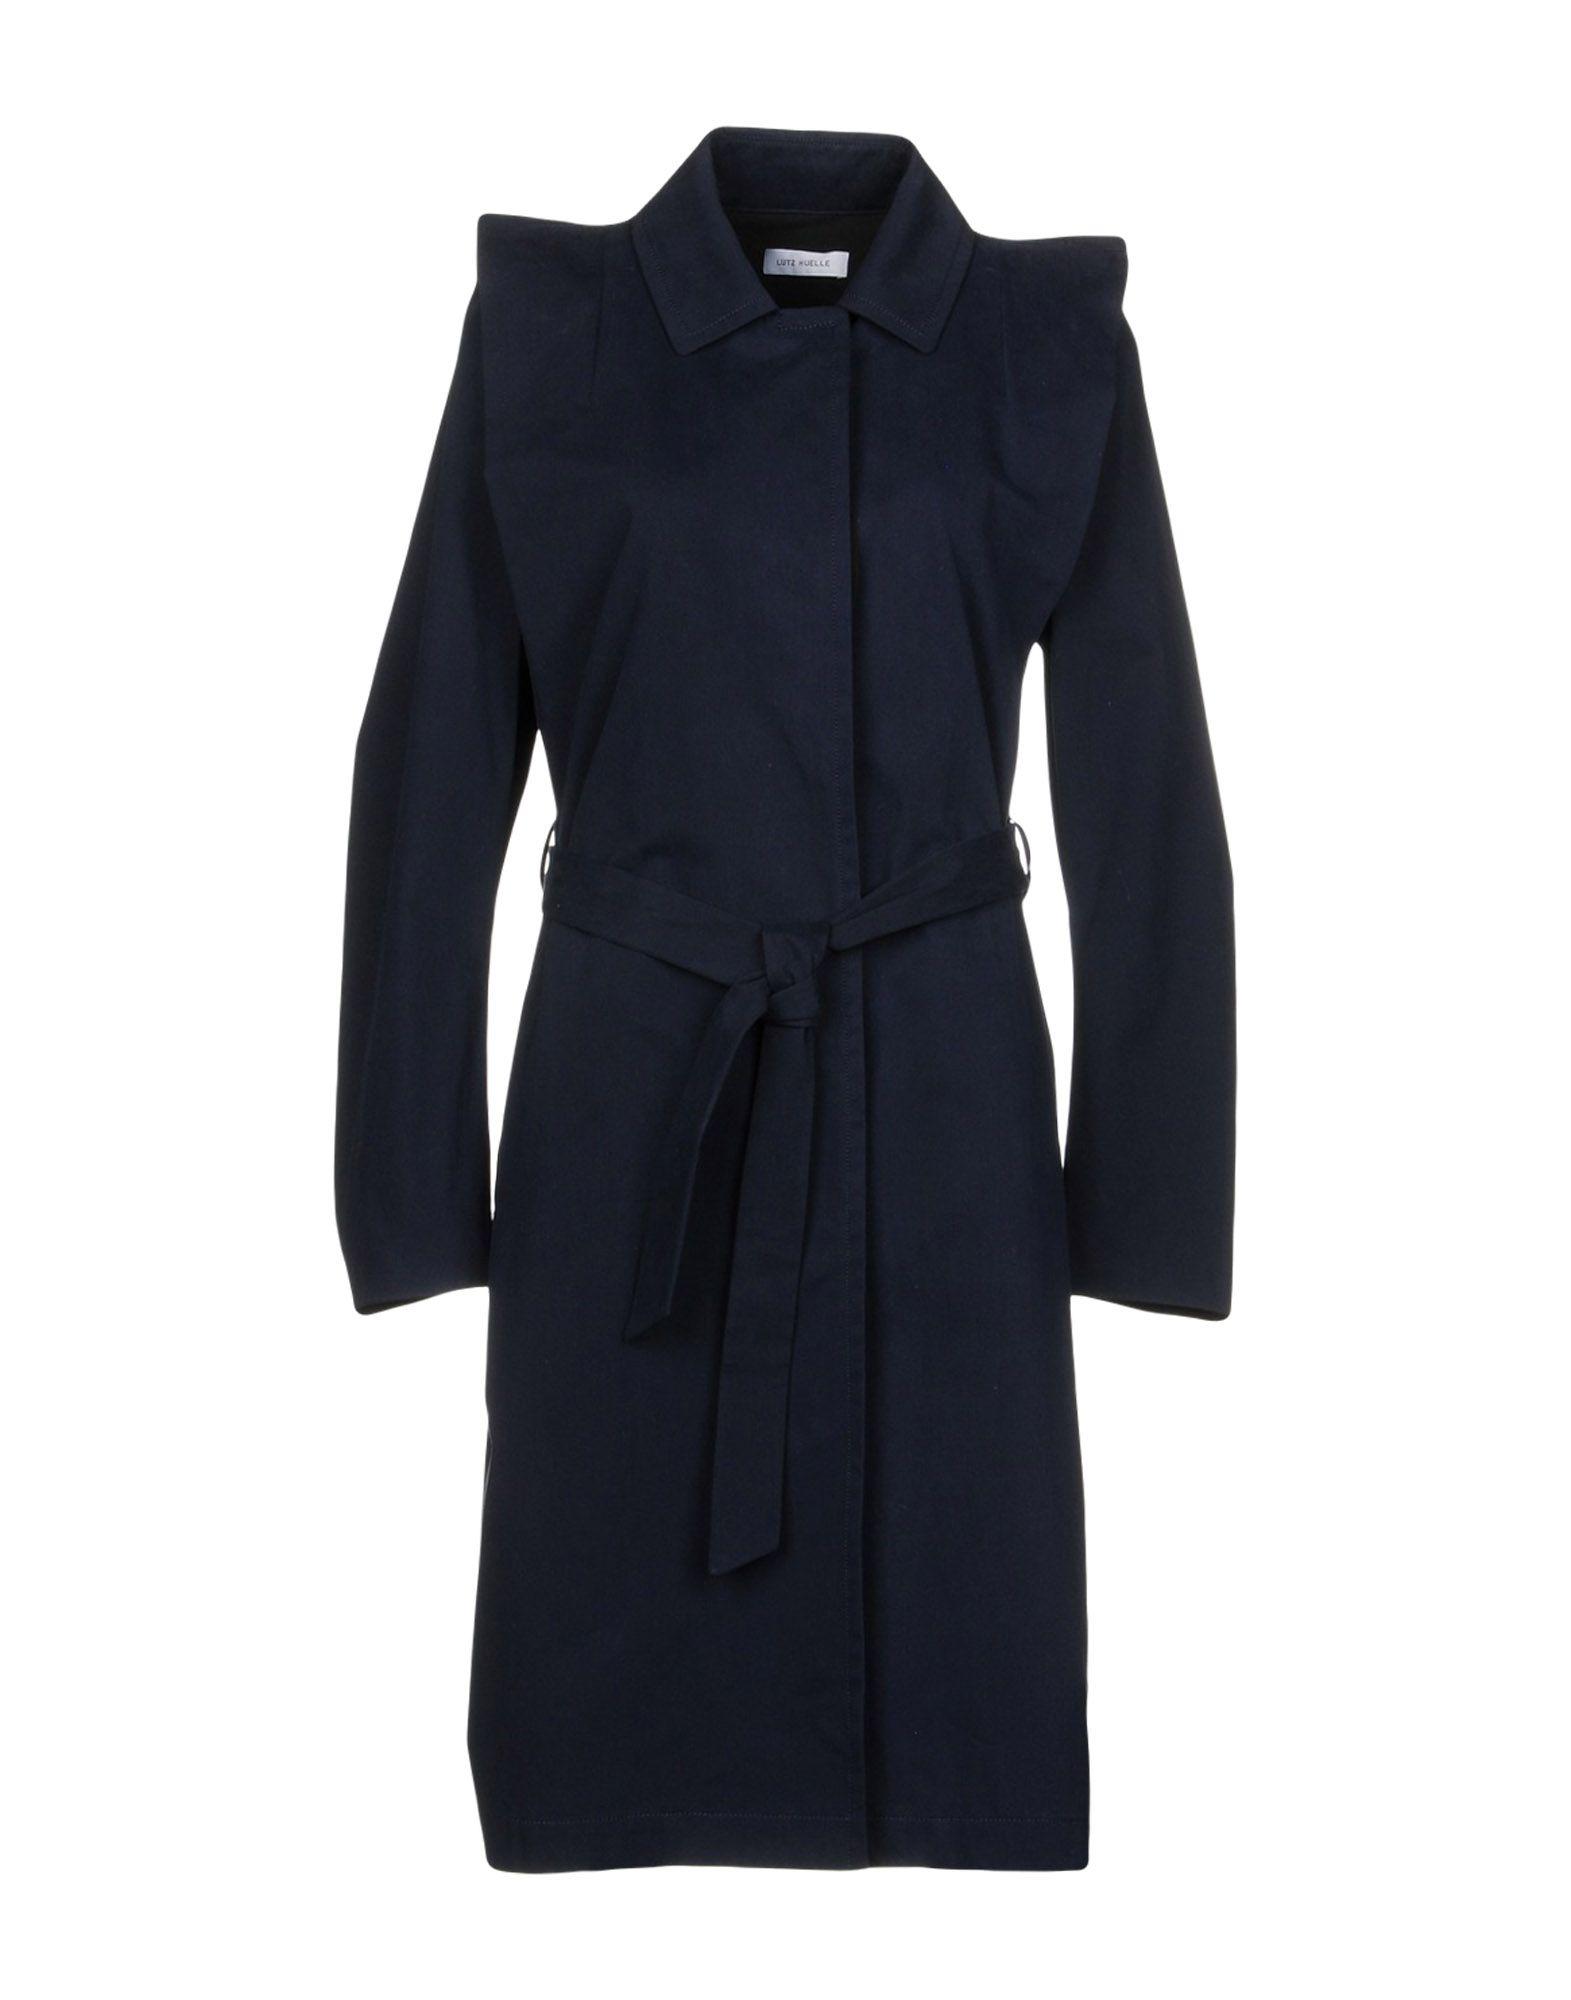 LUTZ HUELLE Full-Length Jacket in Dark Blue